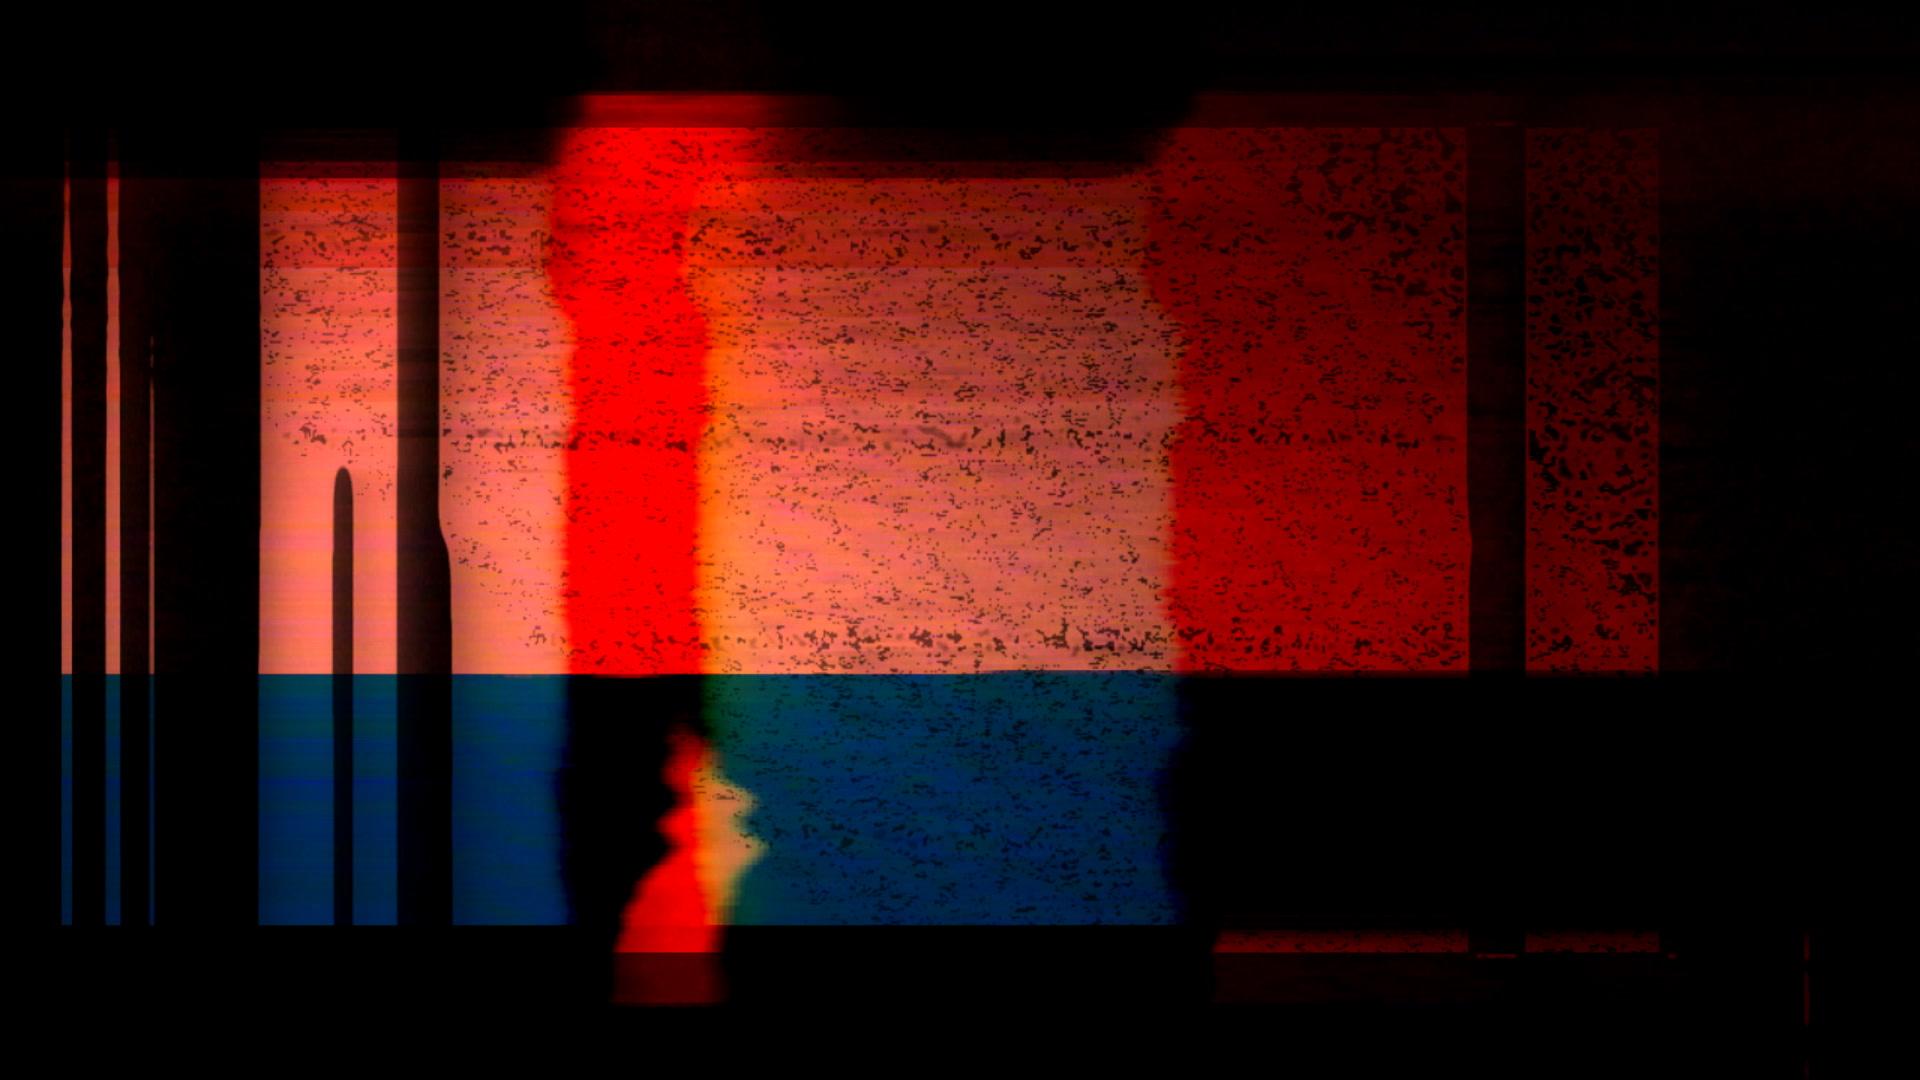 2019-03-01 (62)